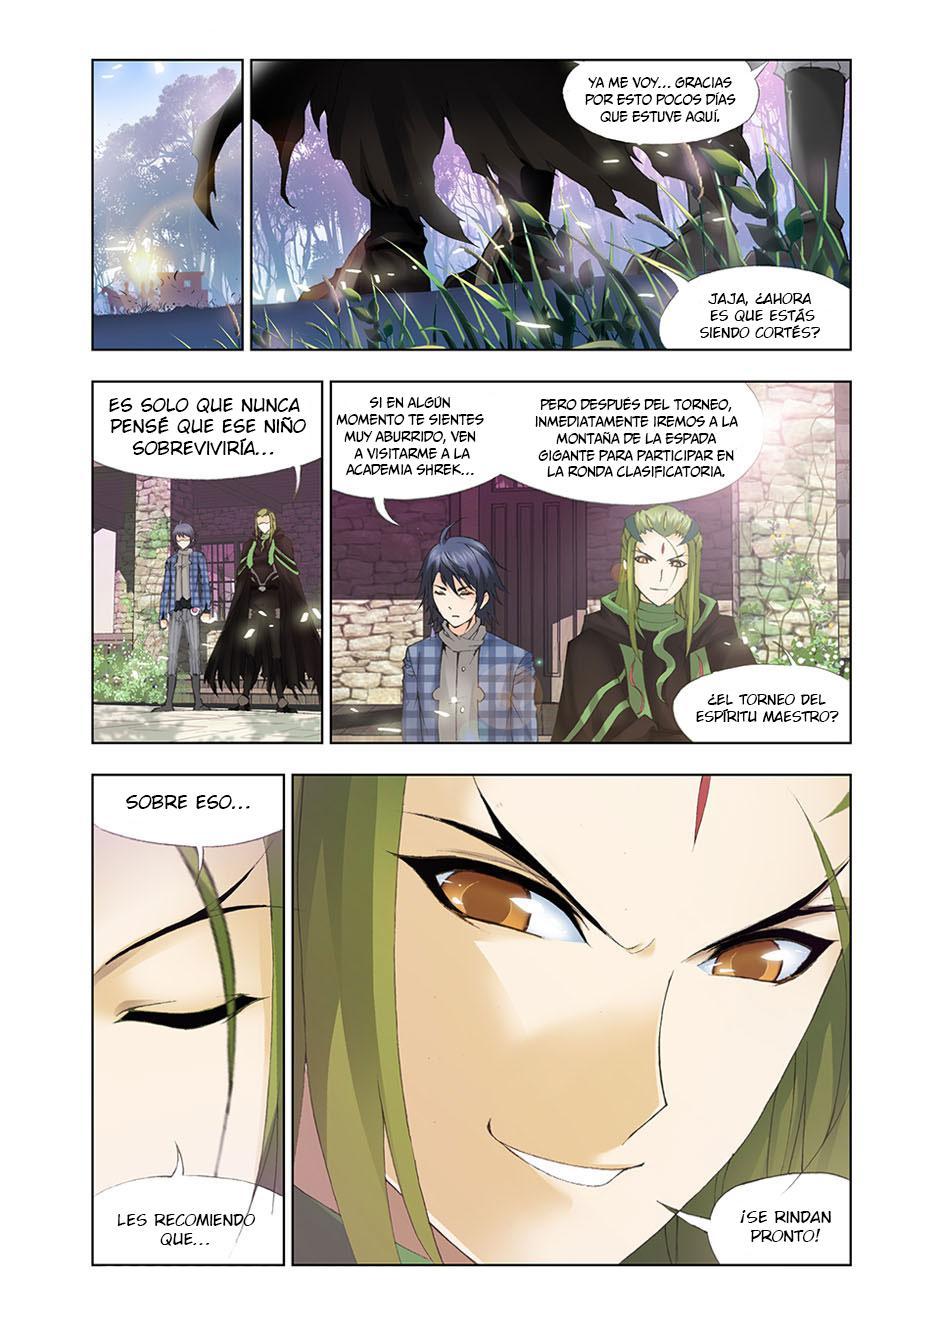 https://c5.ninemanga.com/es_manga/18/16210/417006/1e78b8293f36e0a966e1a87c80aa1282.jpg Page 3